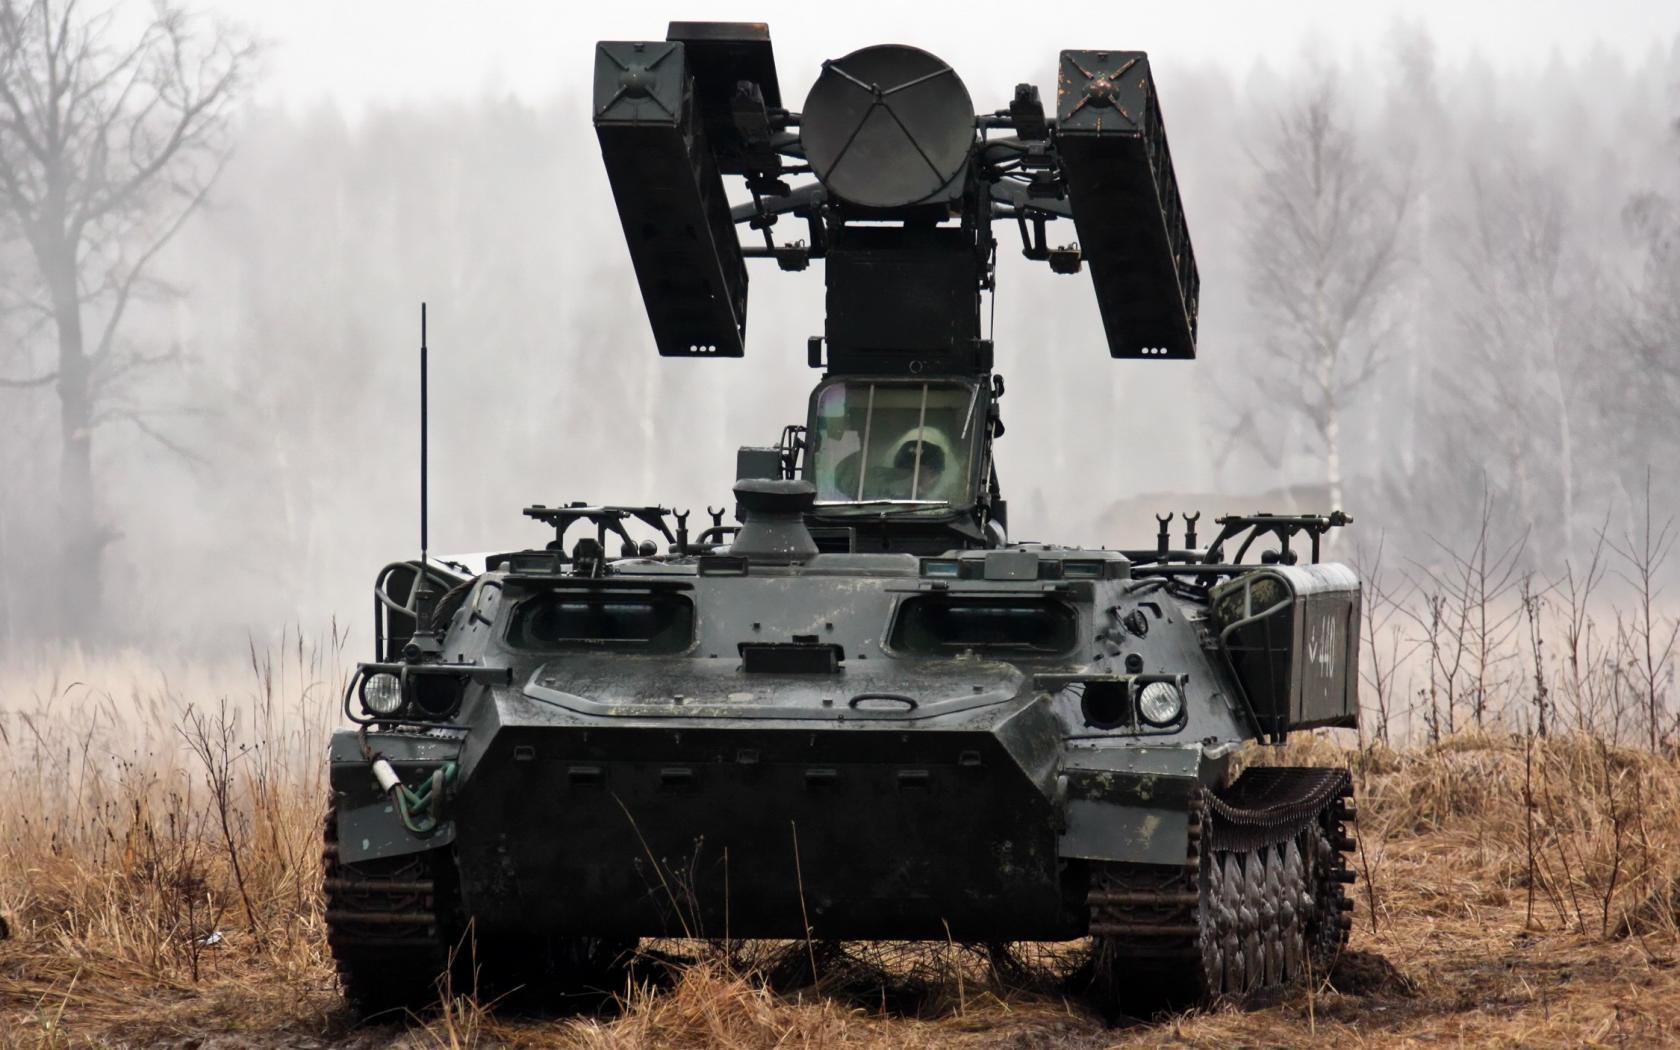 military_weaponry_1680x1050_49924